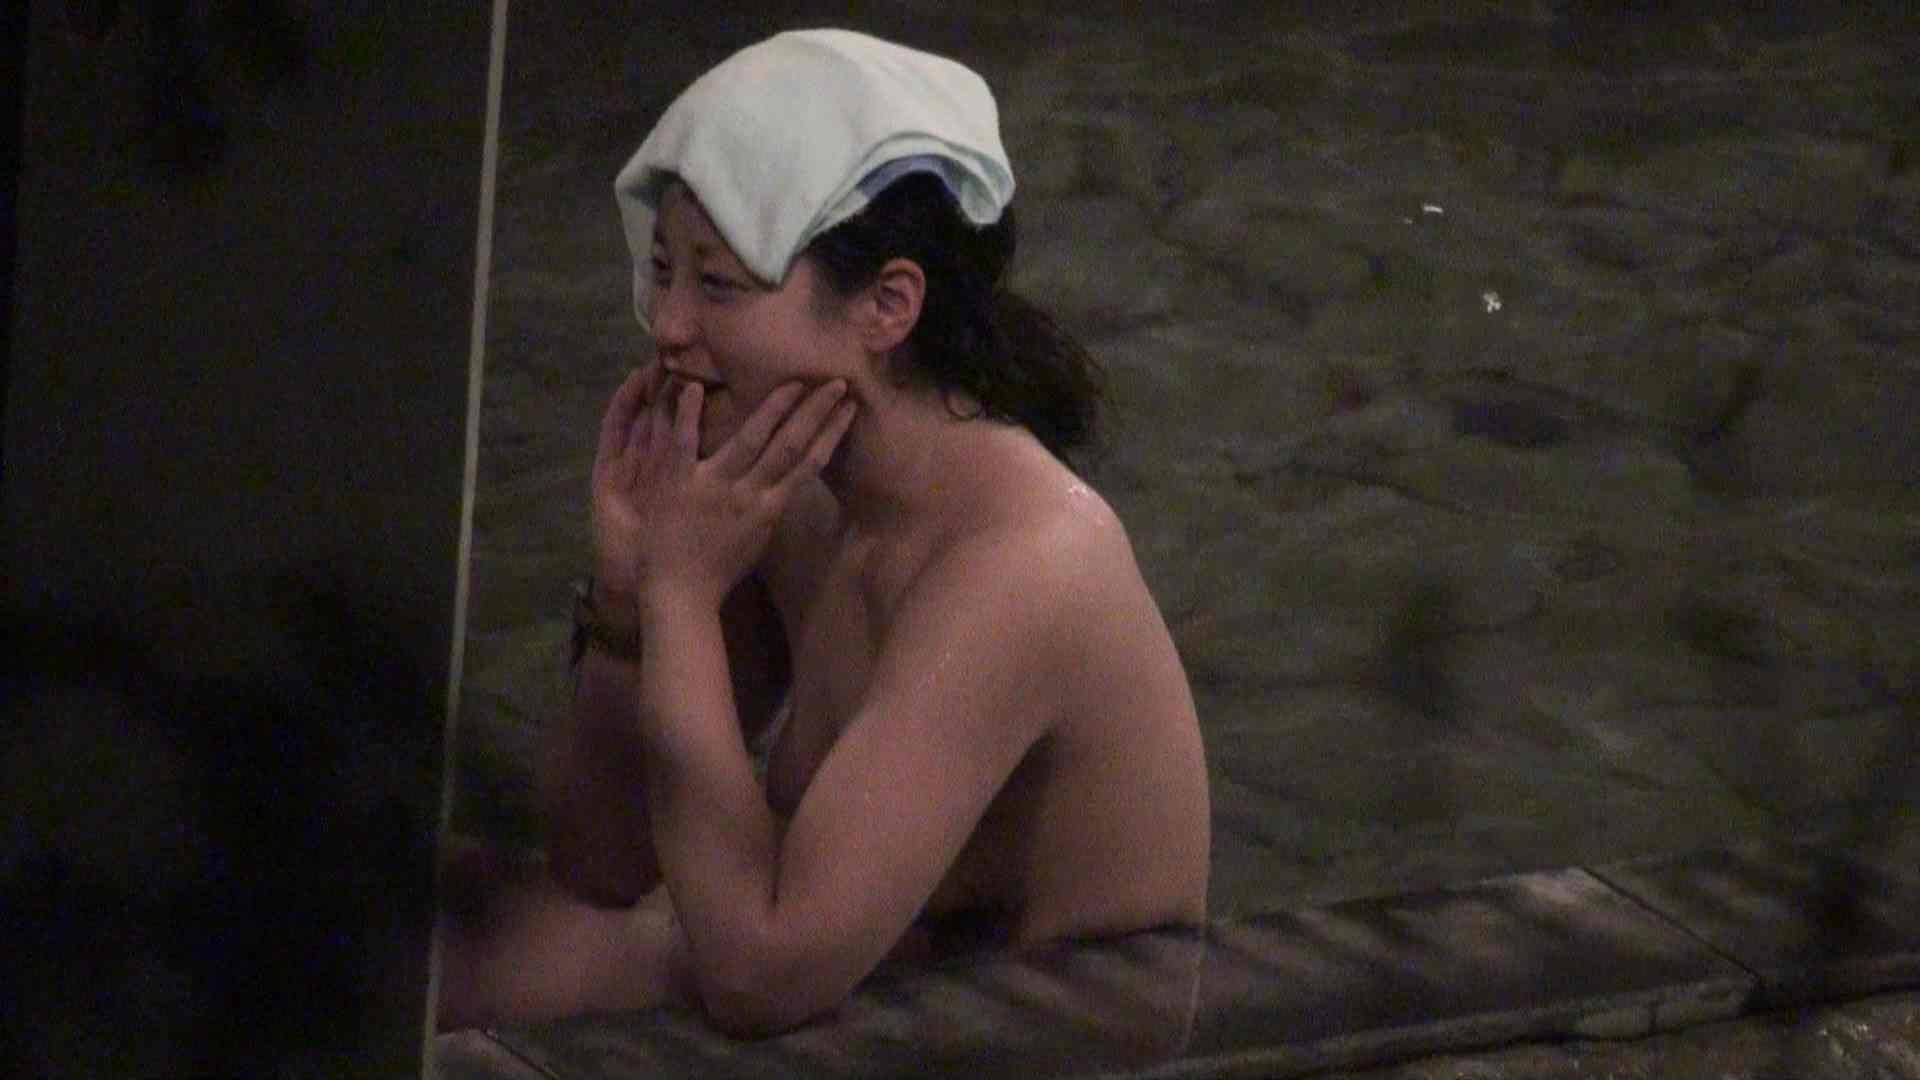 Aquaな露天風呂Vol.397 露天   OLセックス  100画像 82